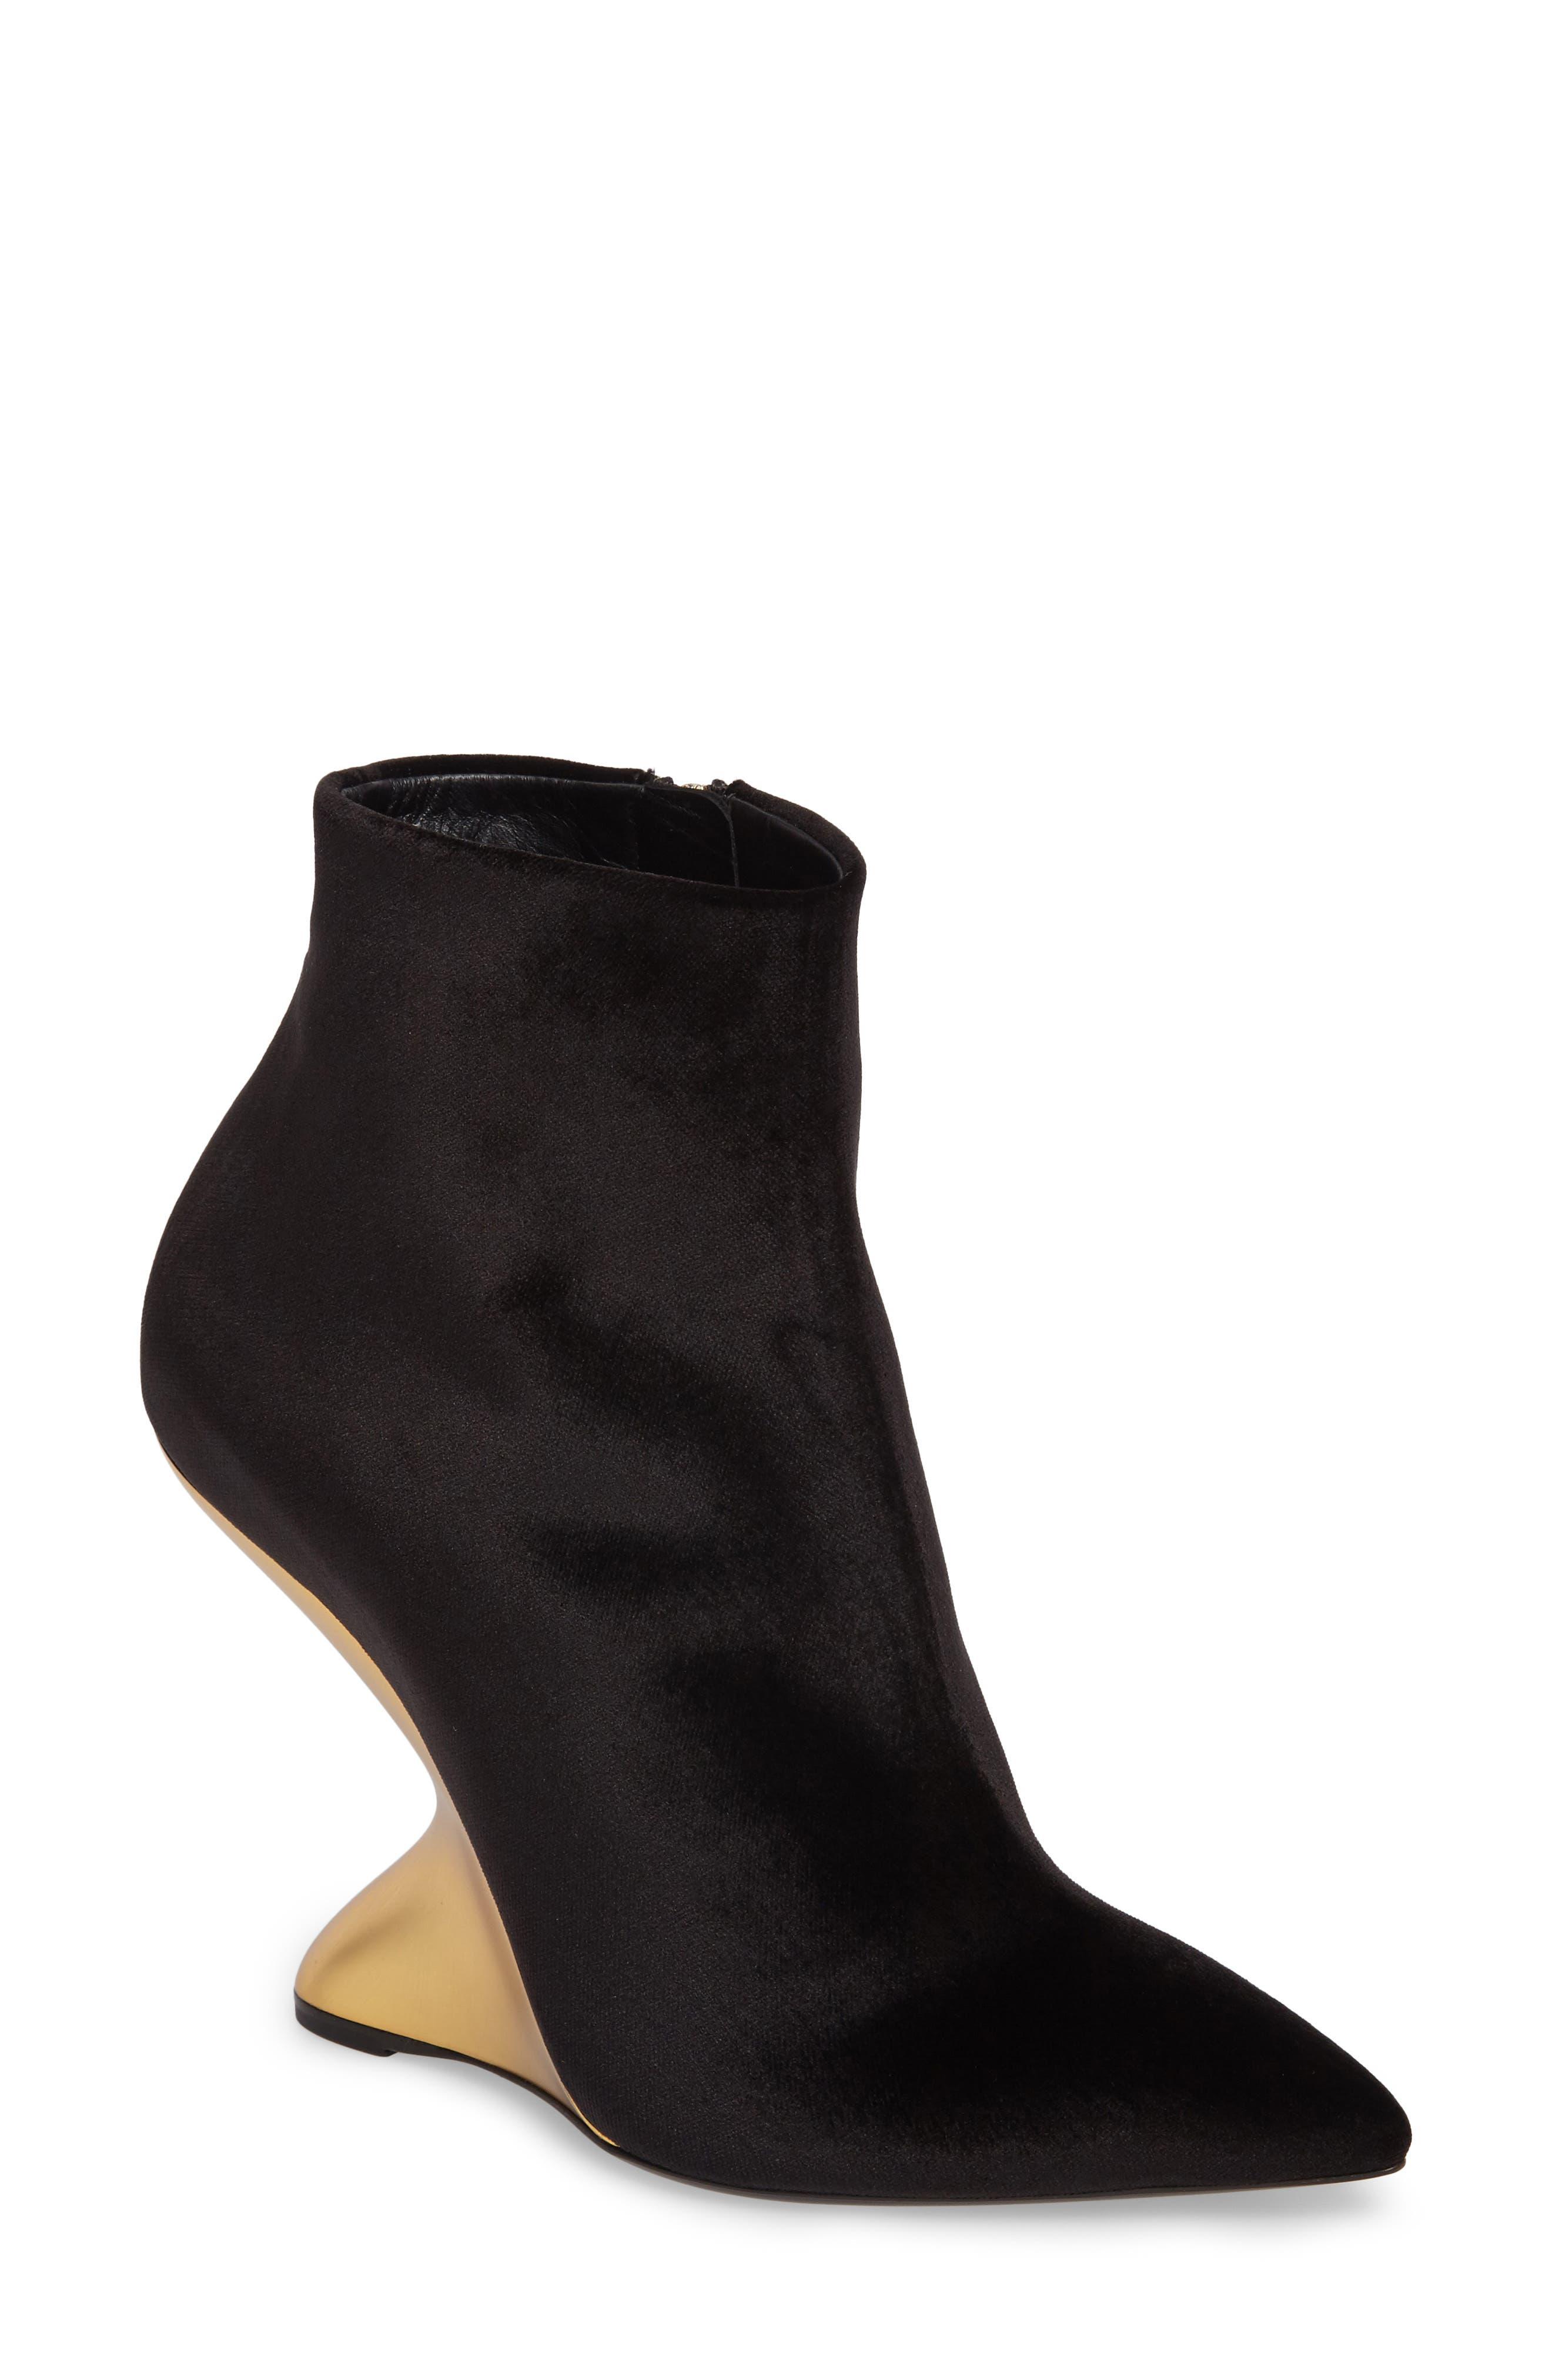 Bolgheri Bootie,                         Main,                         color, Black Velvet